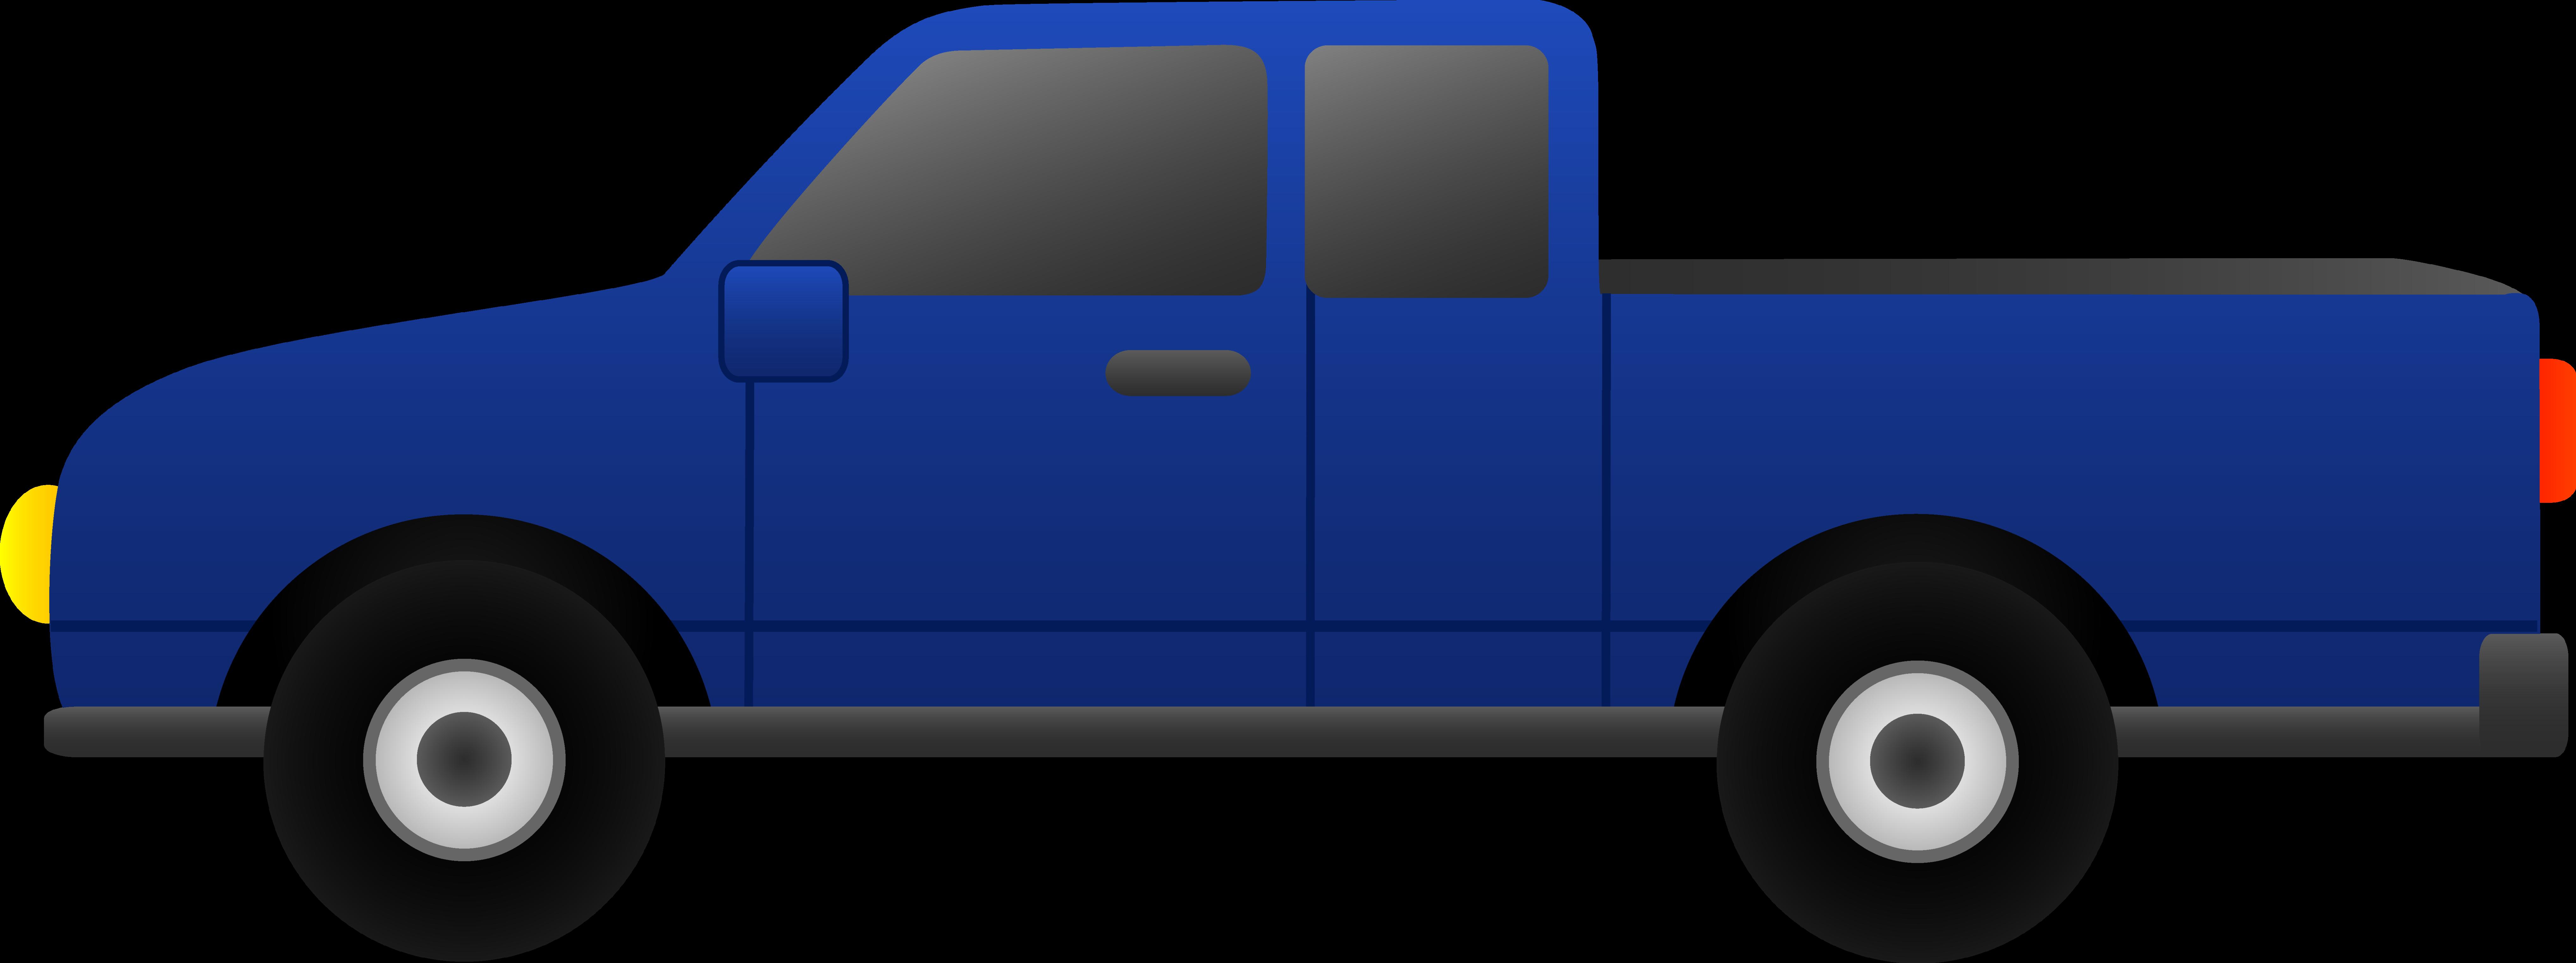 Pick Up Truck Clip Art - ClipArt Best